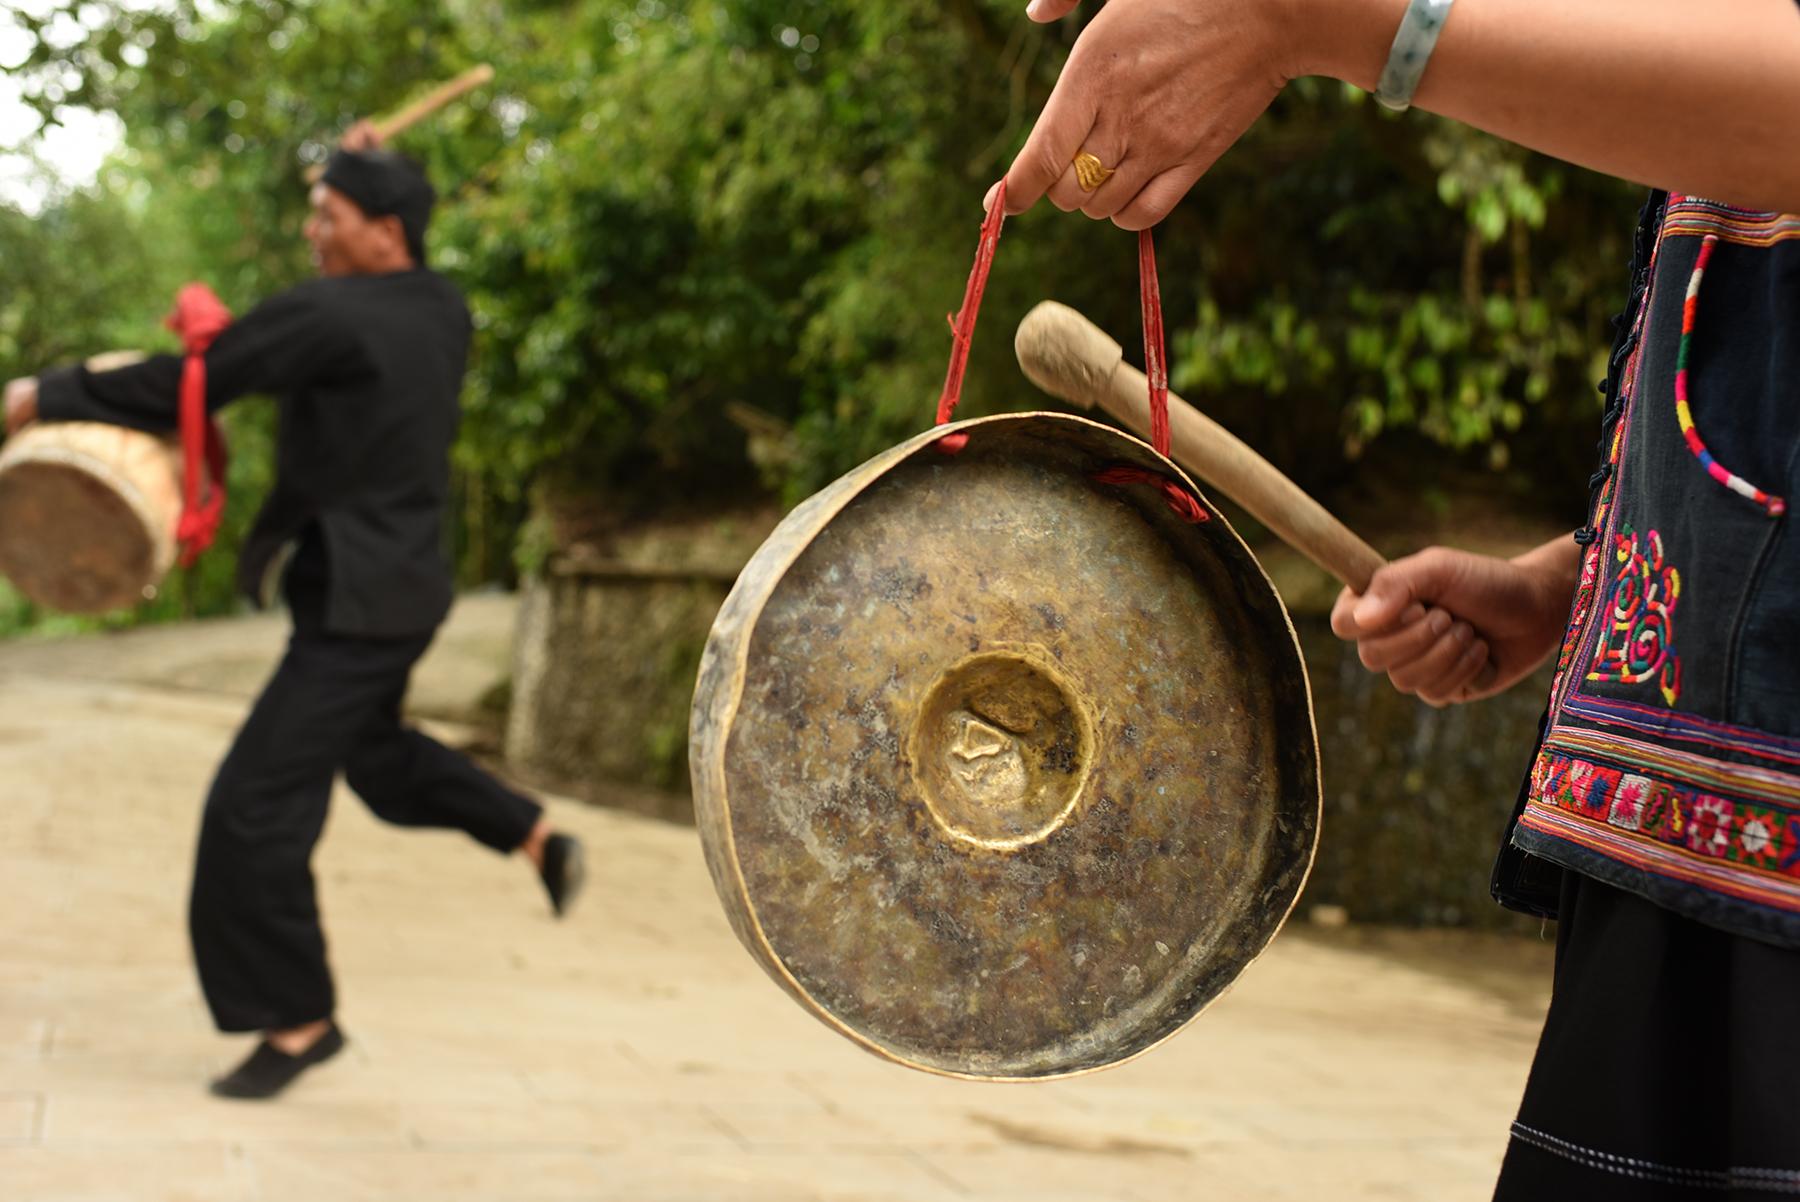 Mang Drum Dance. Potuo village, Yunnan, 2017.